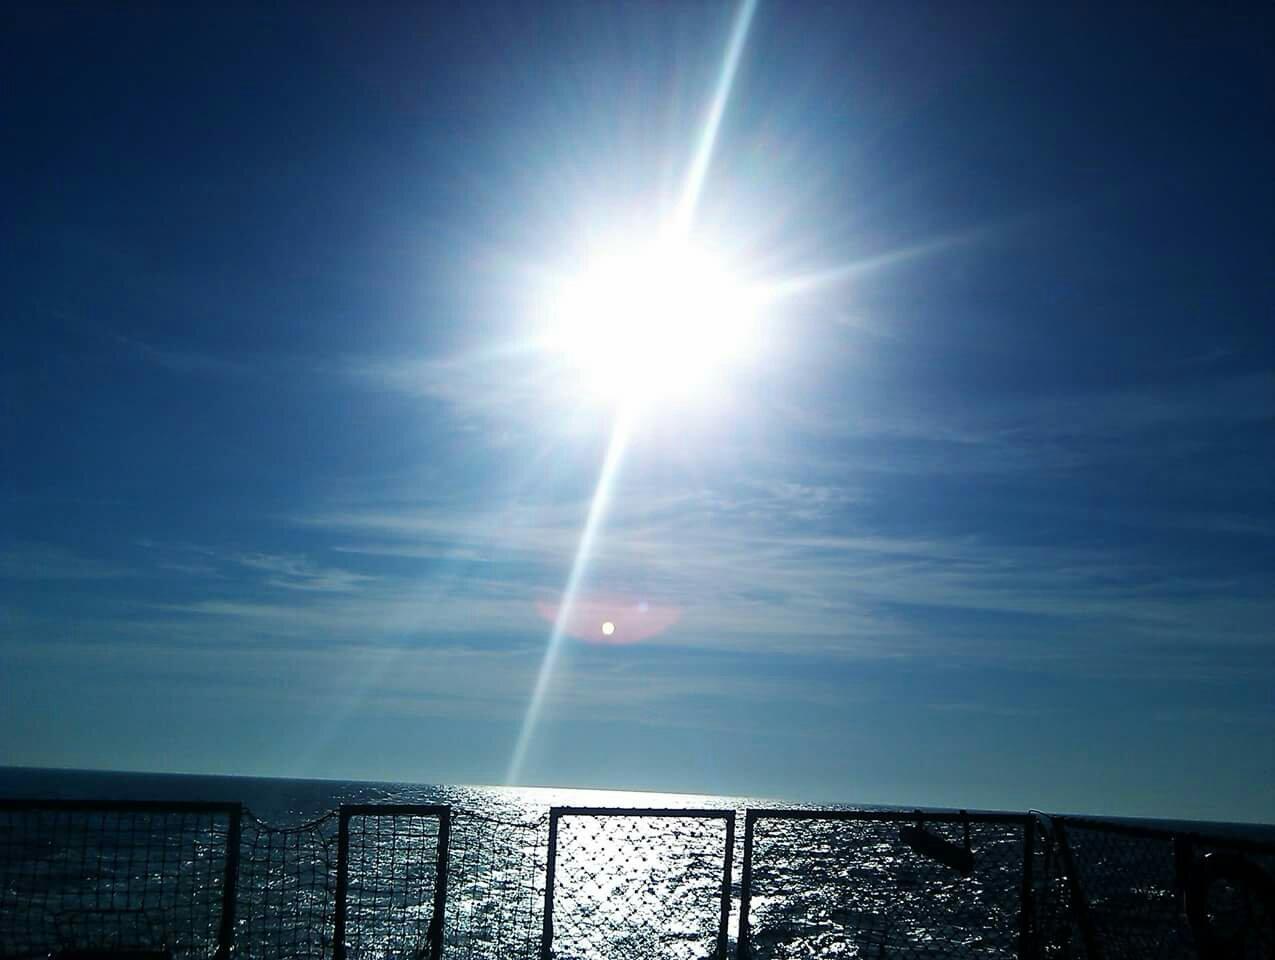 The Sun, Moon, and Stars Prove the Flat Earth 0636a4002c62c3d020c48baee9fed7ed